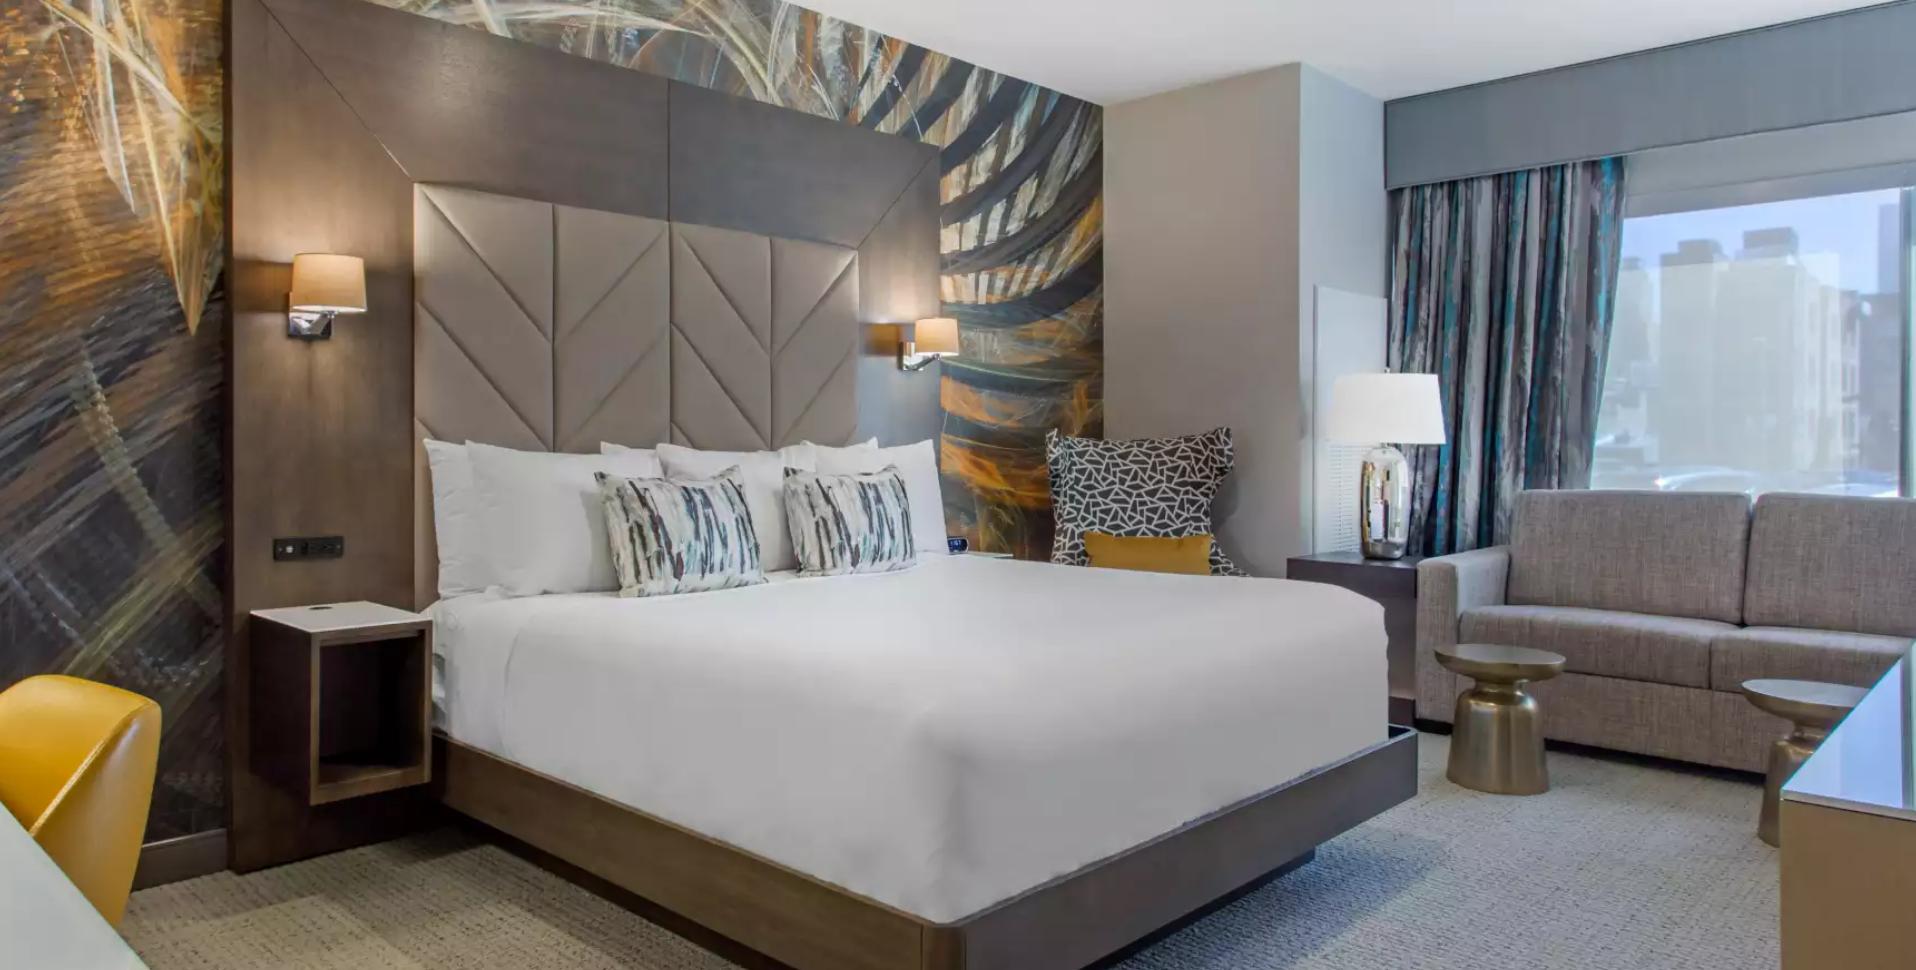 https://www.hotelsbyday.com/_data/default-hotel_image/3/18183/screenshot-2020-06-11-at-3-59-47-pm.png